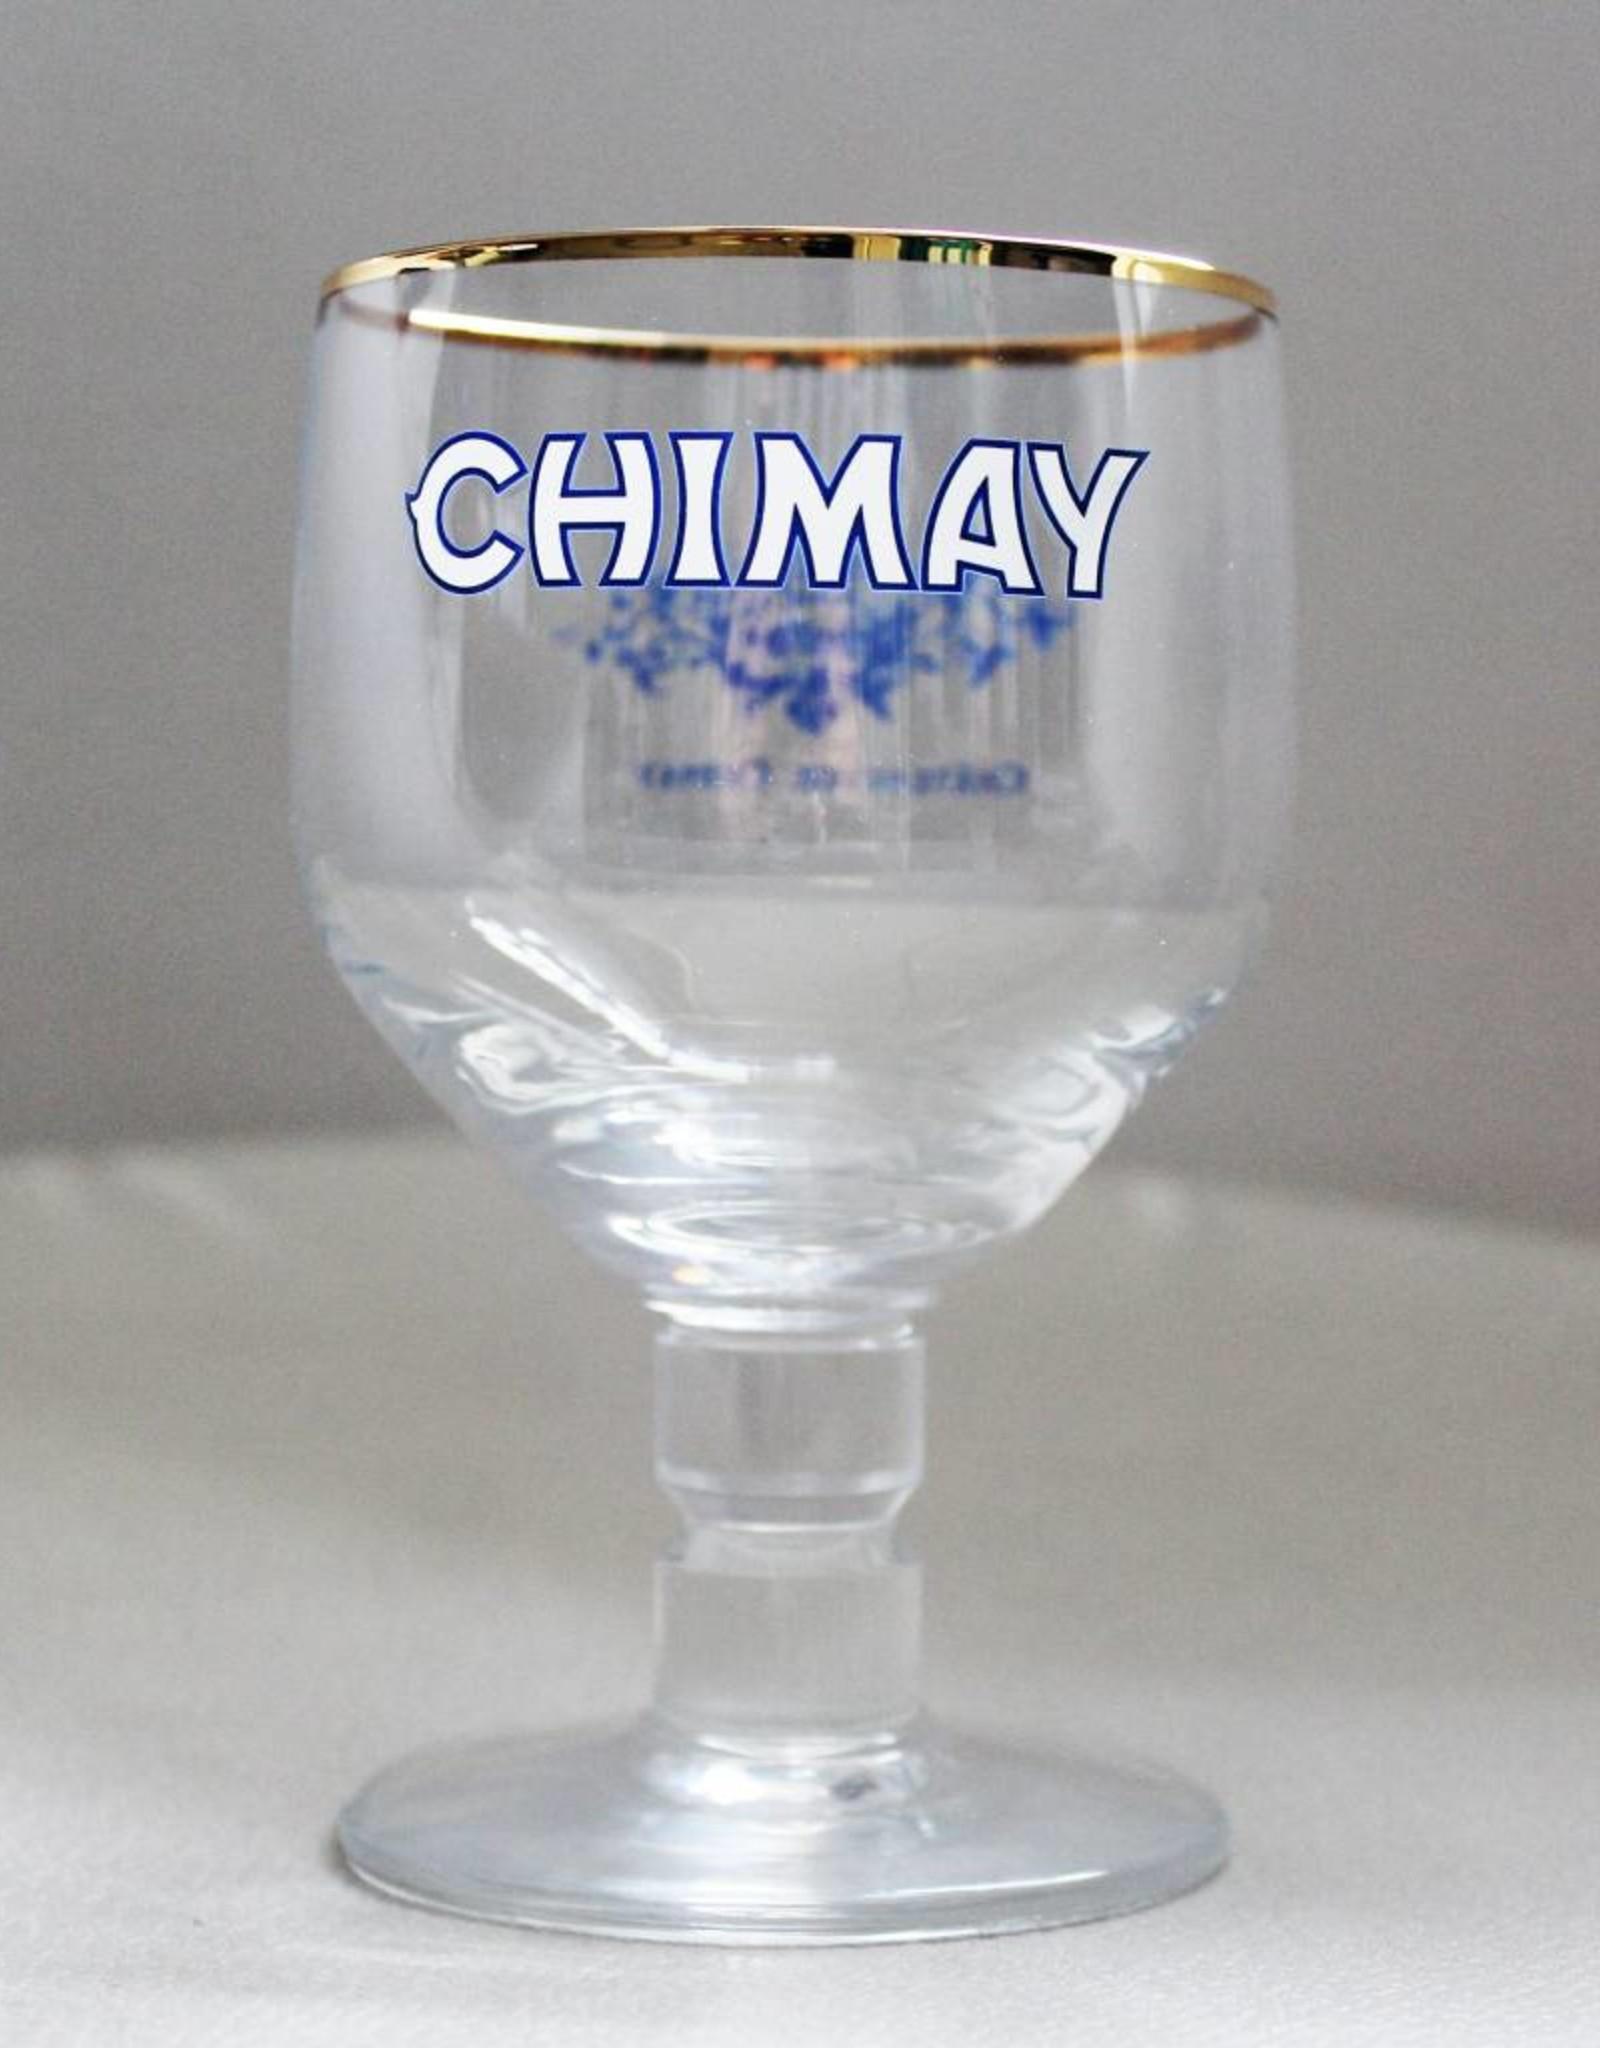 Château de Chimay Verre Chimay 18cl gourmet